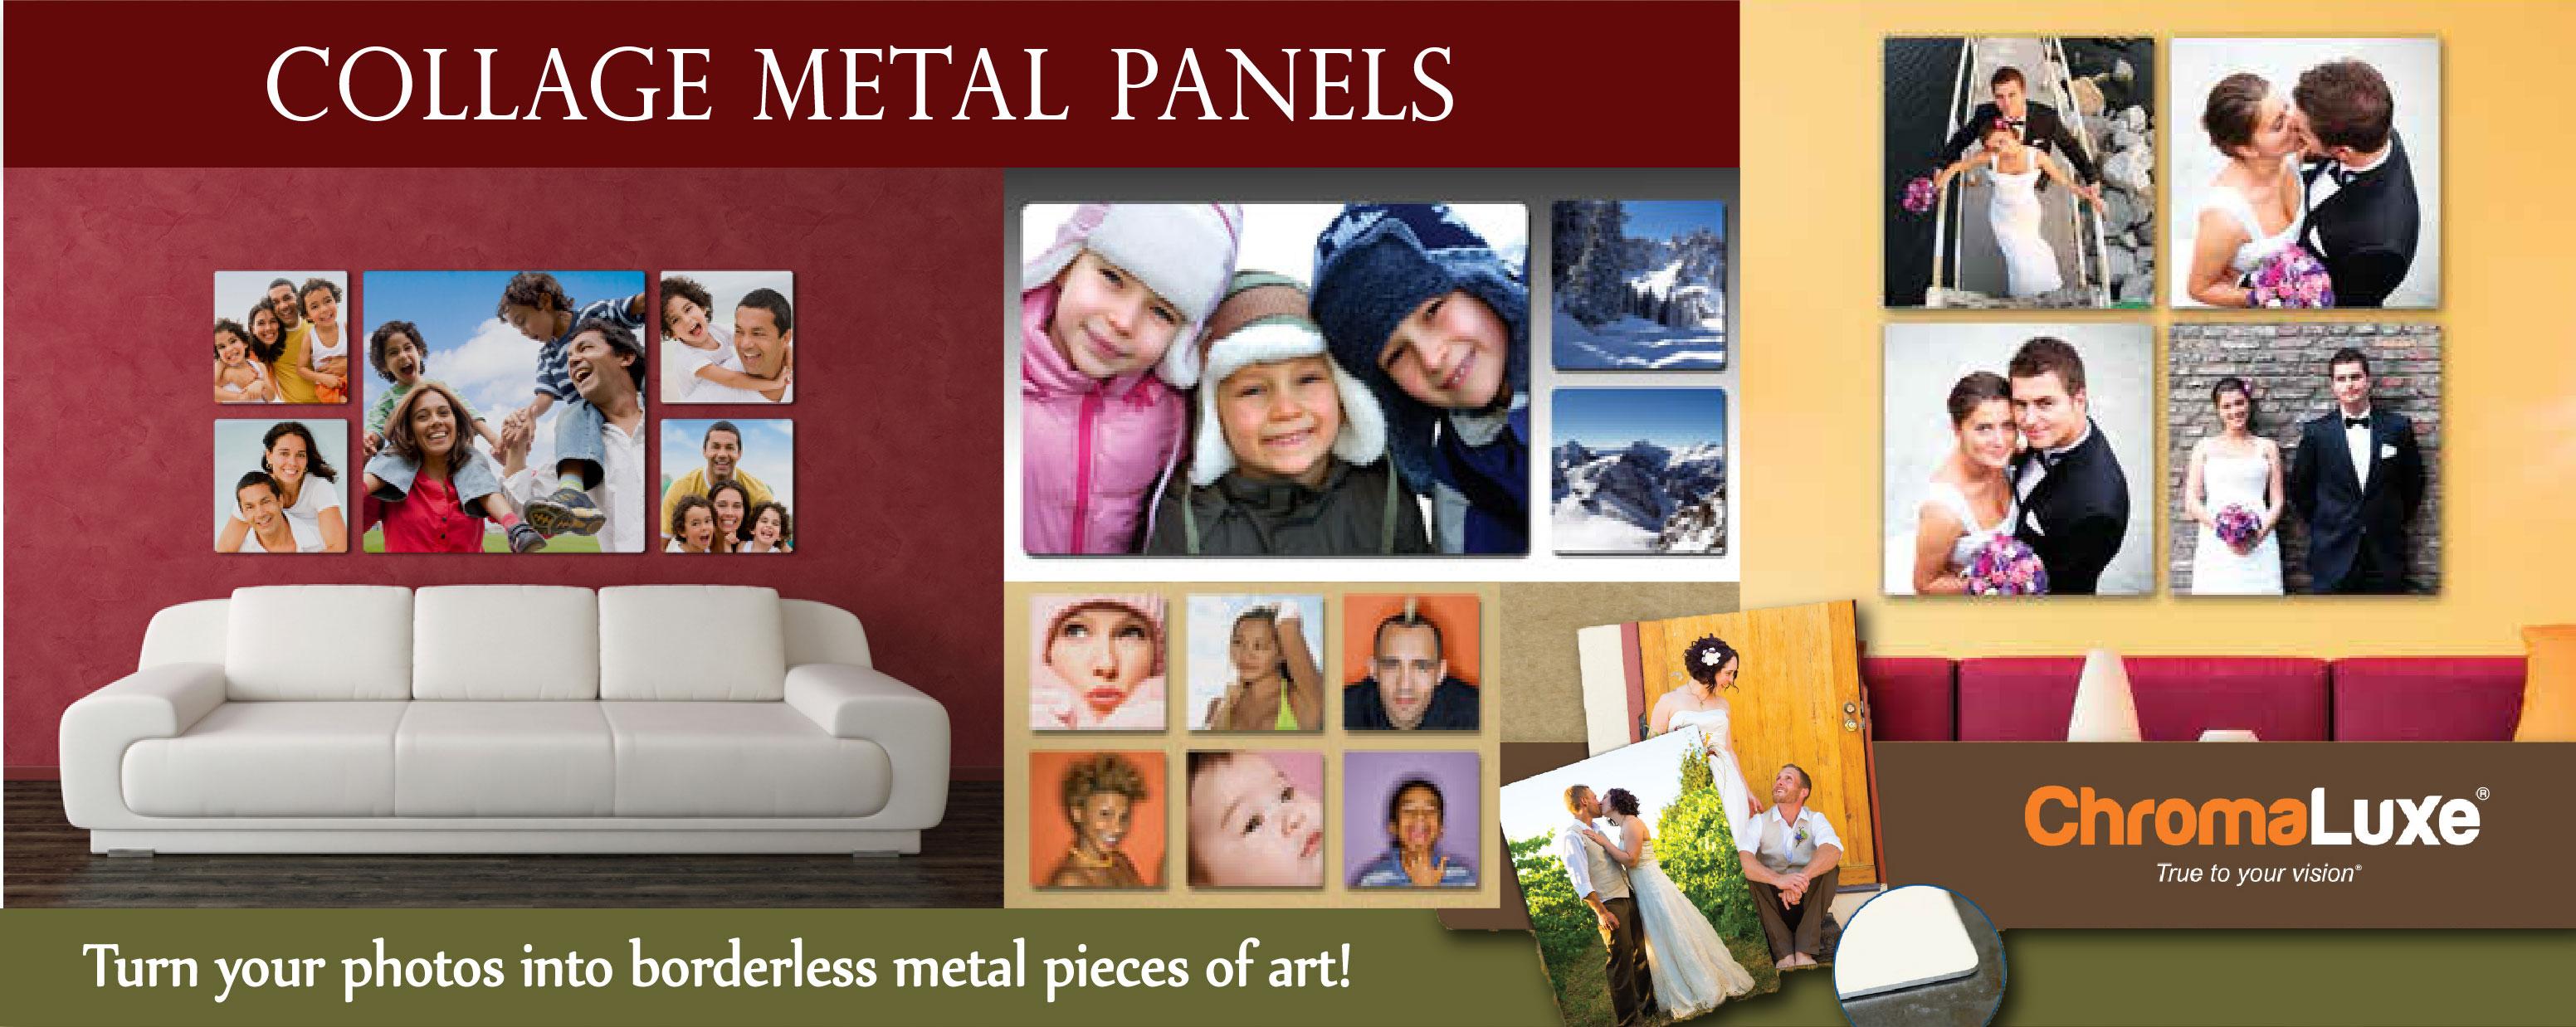 collage-metal-banner-01.jpg